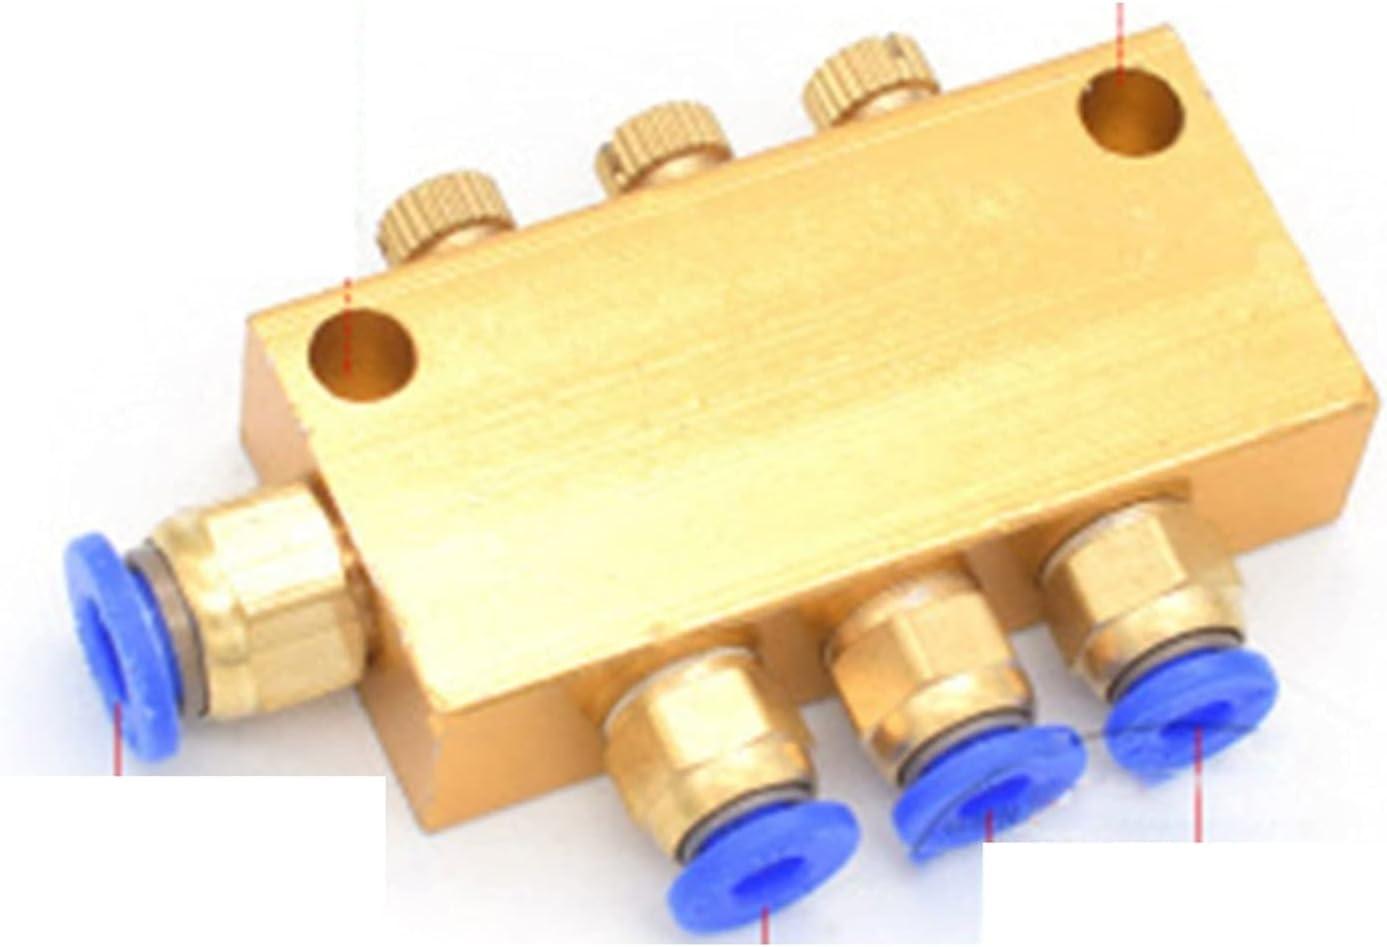 KHJK Lube Oil Piston Distributor, 2 3 4 5 6 7 8 9 10 12 Way Mani